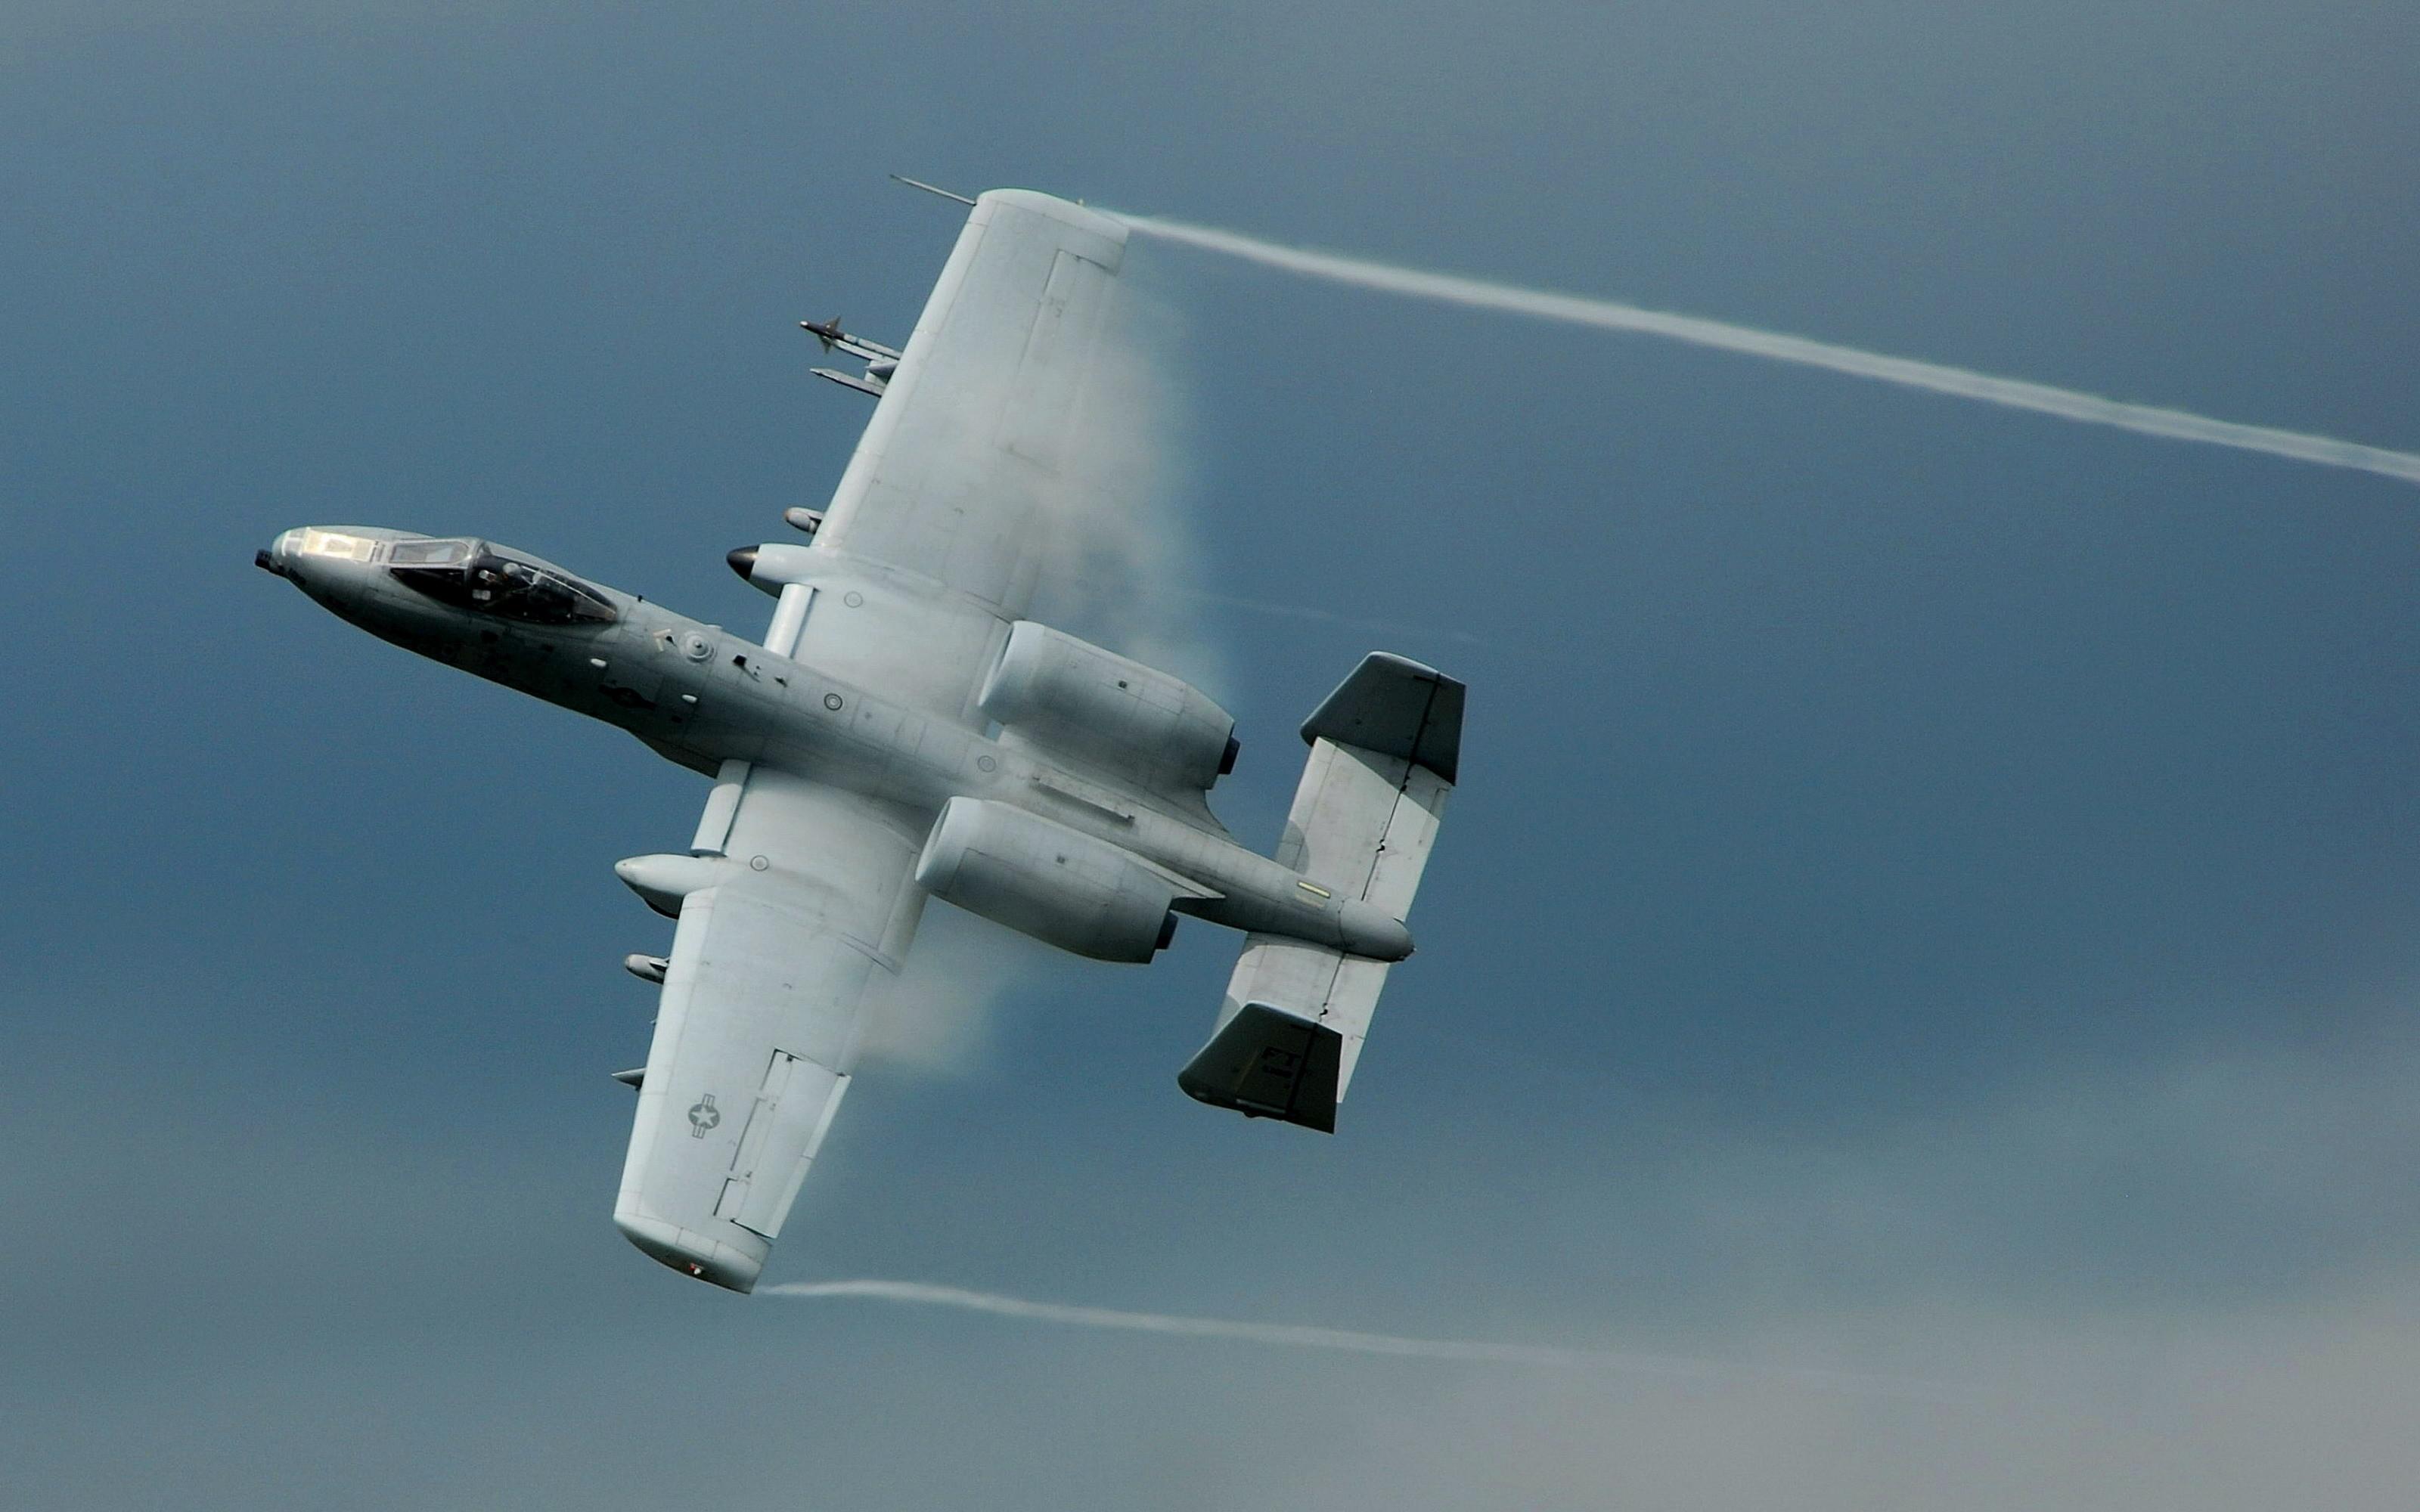 Planes Military War A-10 Thunderbolt II Warthog Aircraft